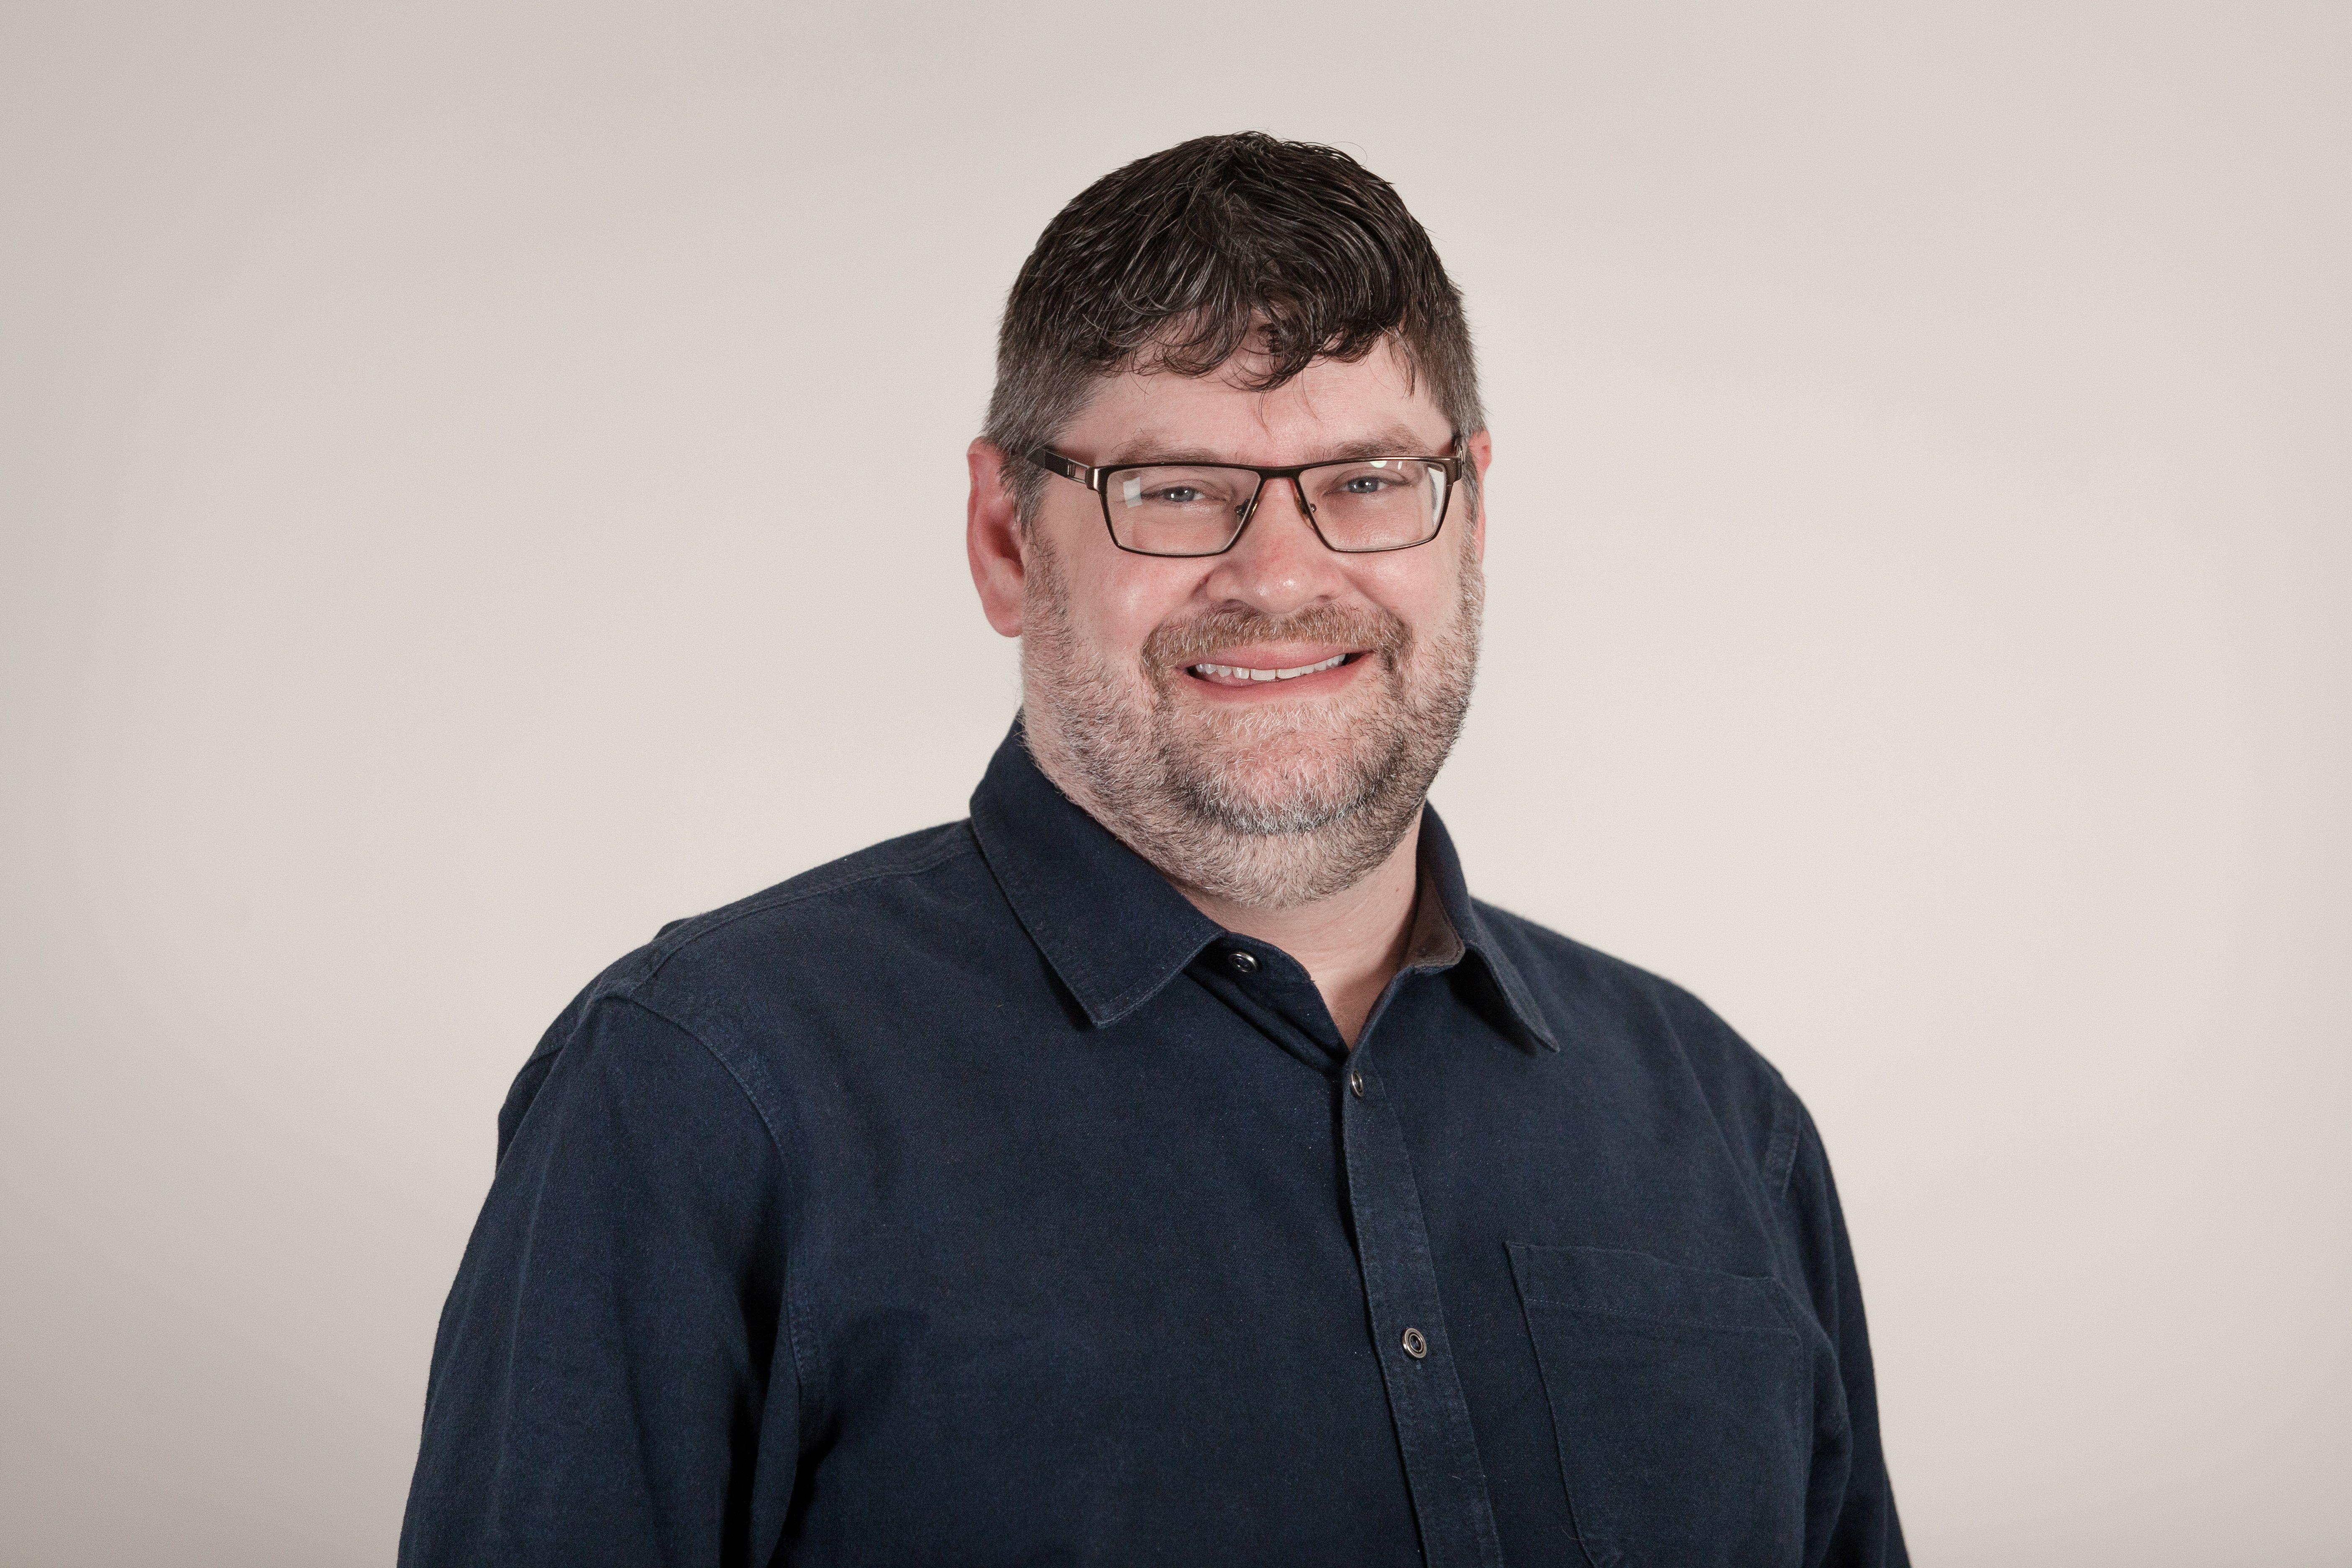 protocol.com - Joe Williams - Meet the startup behind UiPath, Confluent, Zoom and Okta's IPOs